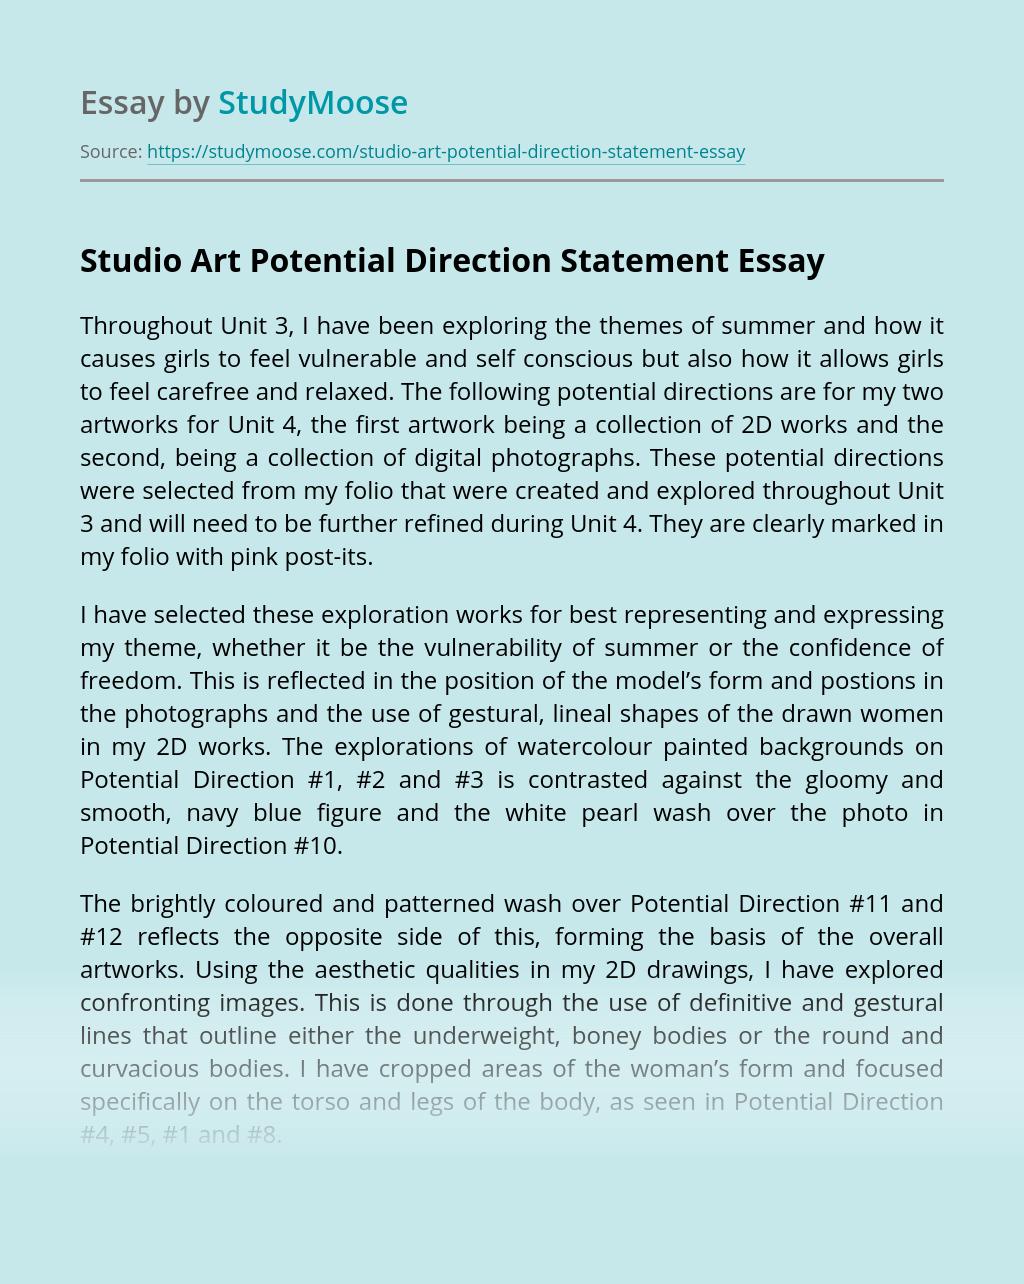 Studio Art Potential Direction Statement